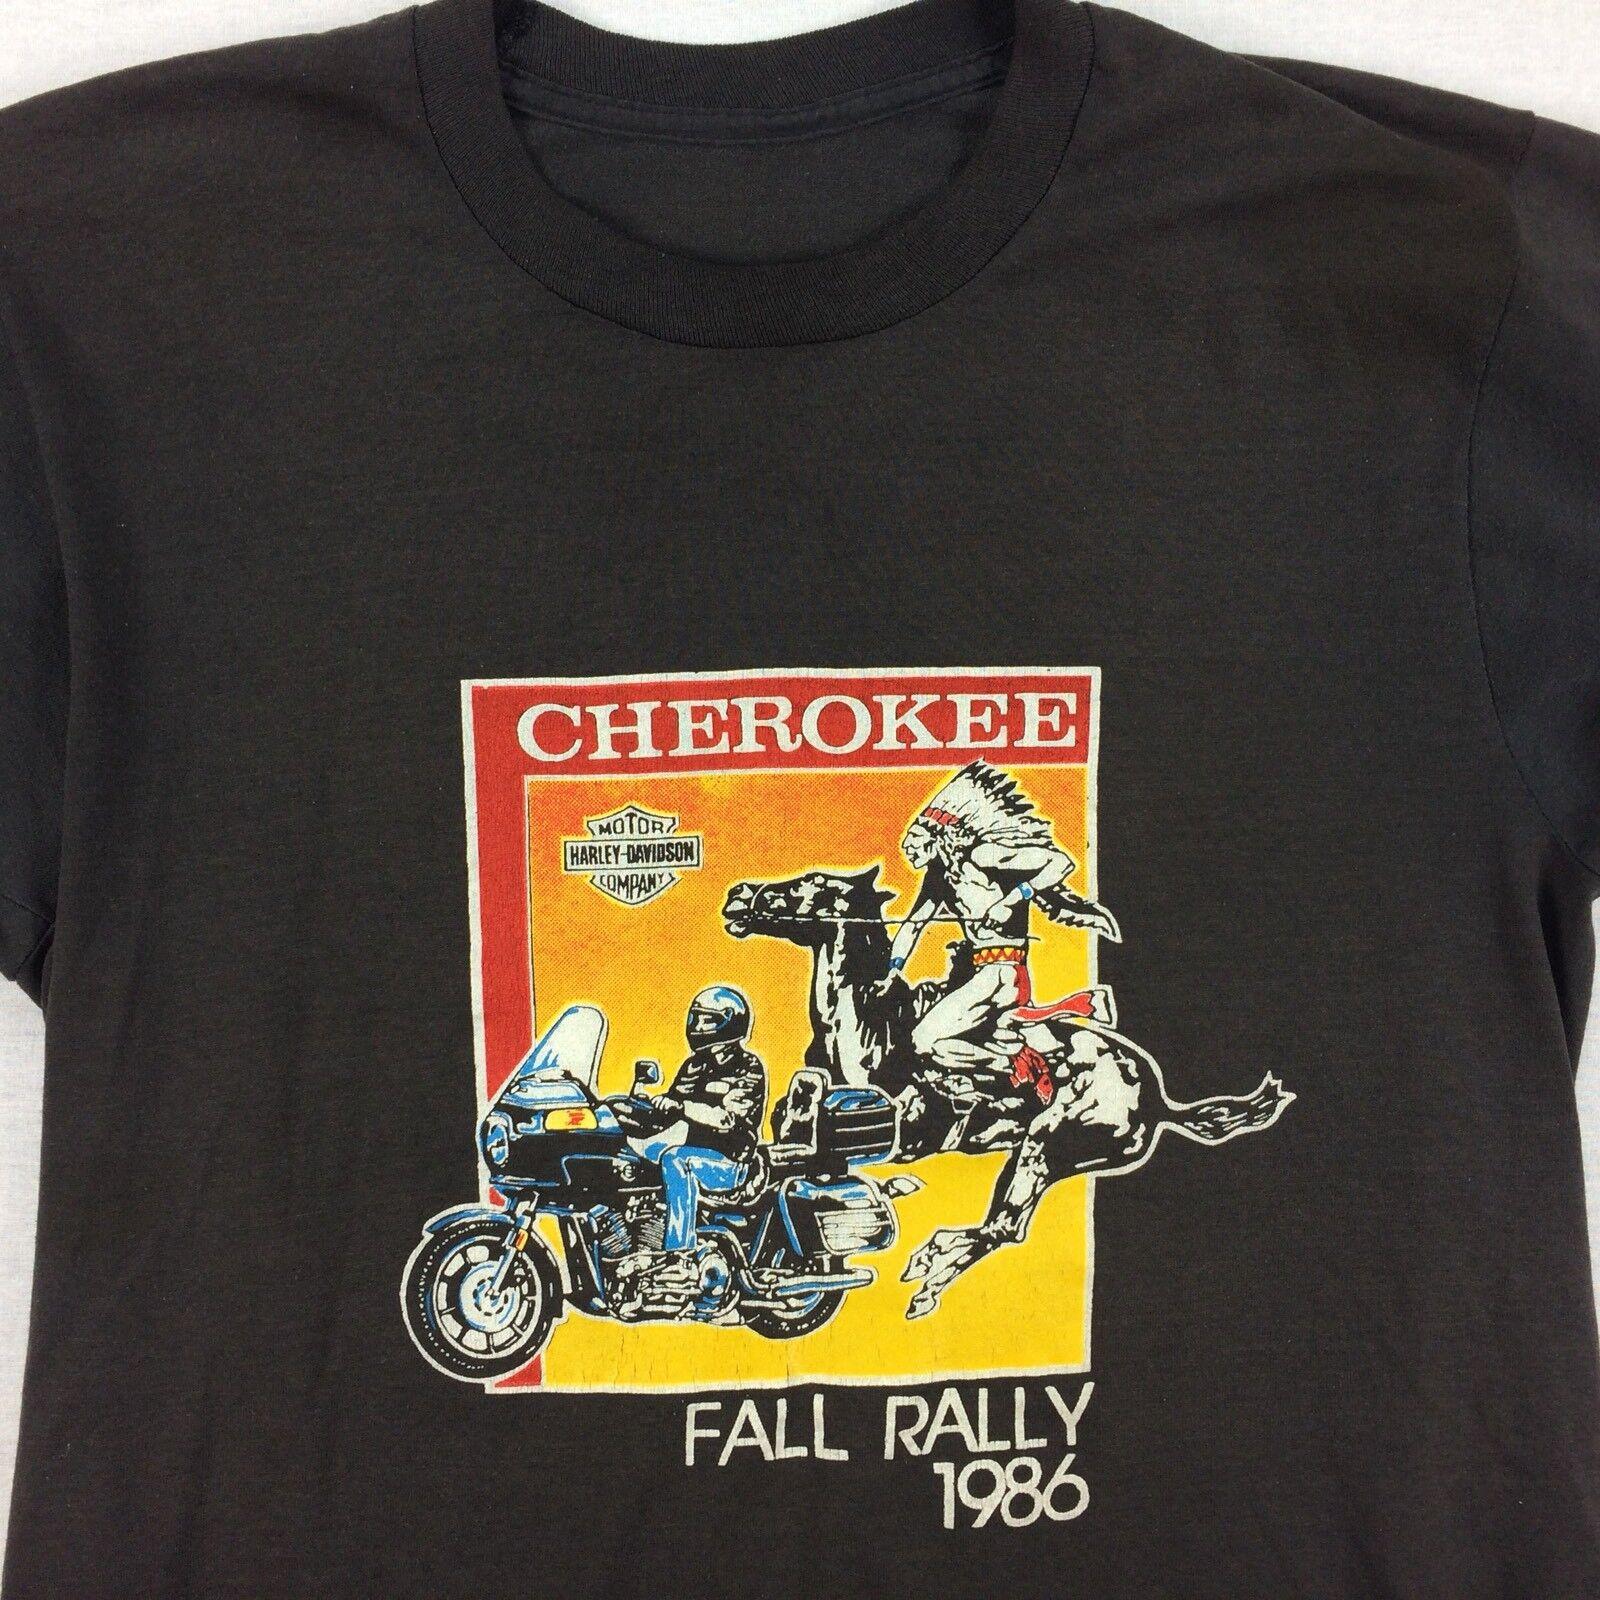 VTG Distressed Faded 80s Harley-Davidson T-shirt MEDIUM Cherokee Fall Rally 86'